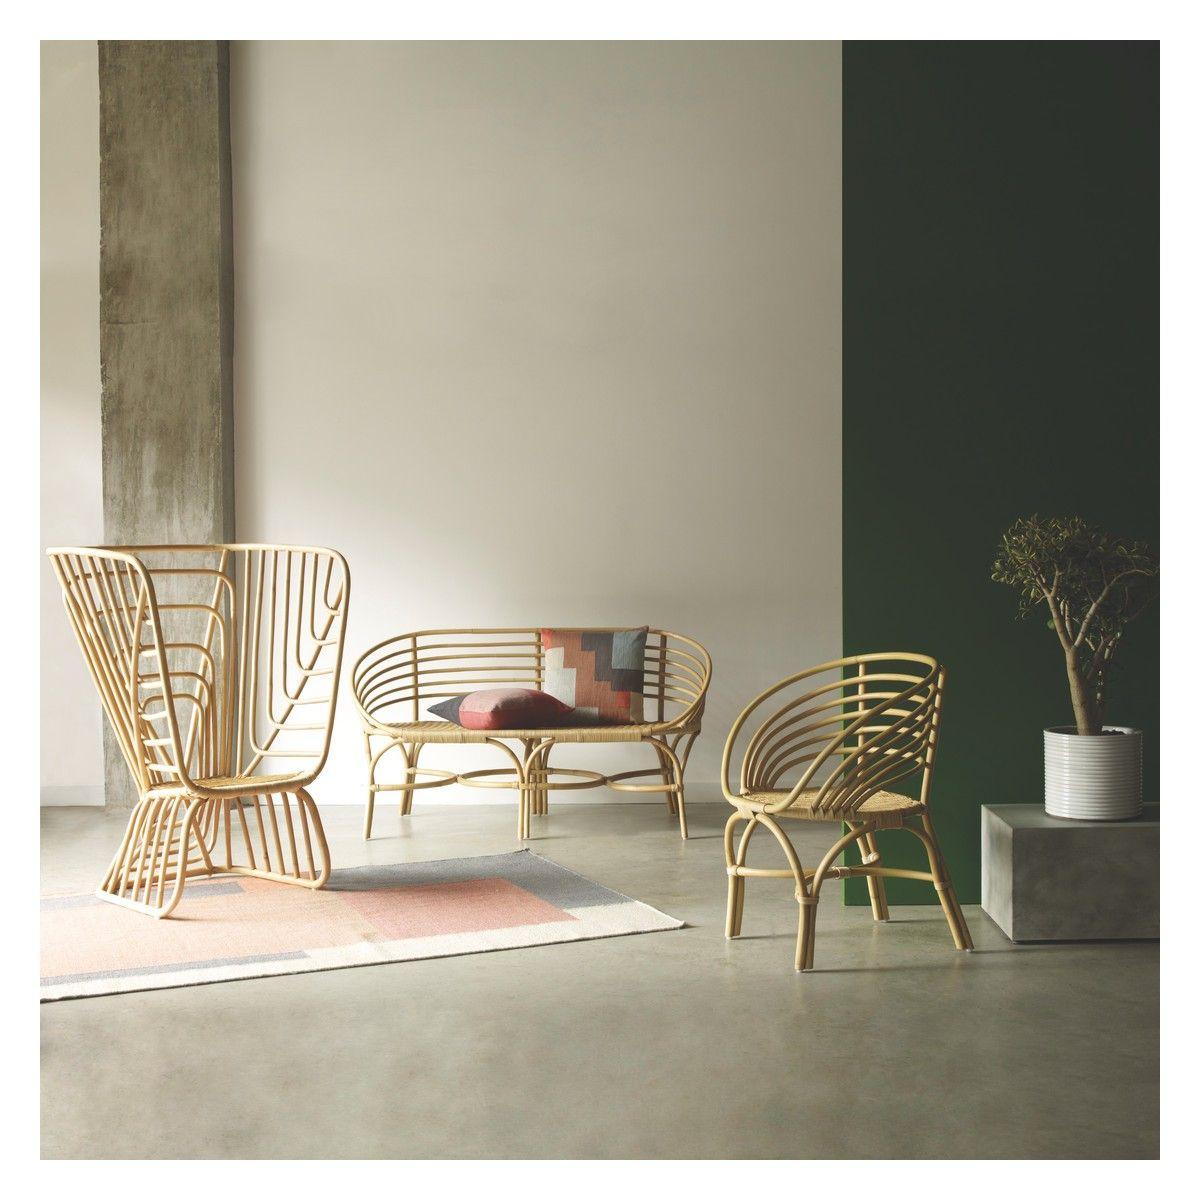 AVIA Rattan garden bench | Buy now at Habitat UK | bamboo ...